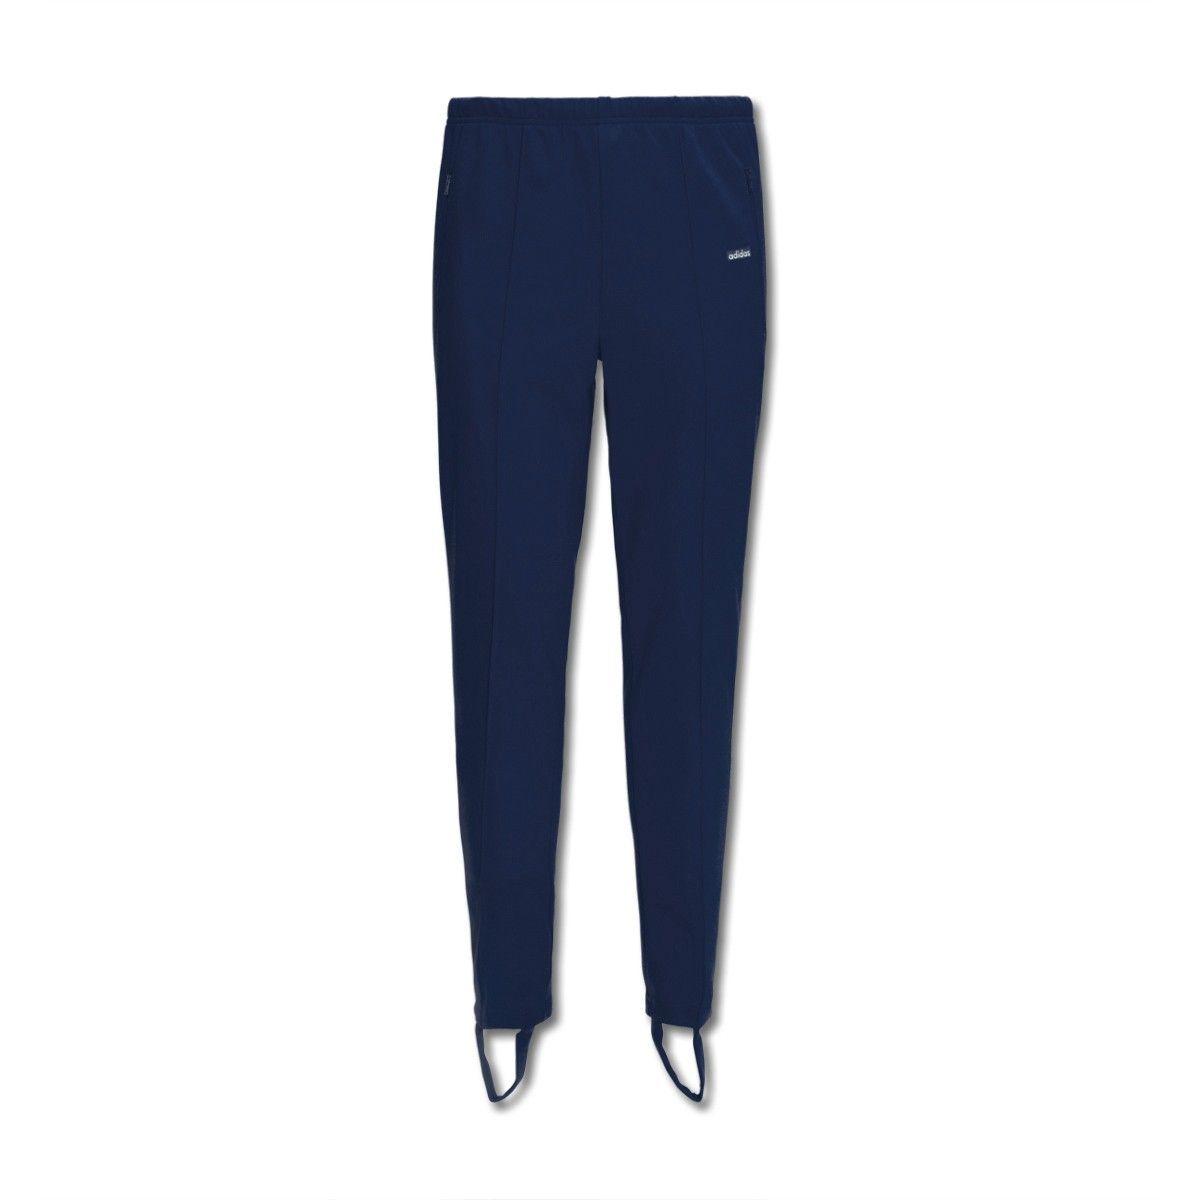 0c188b6c0 adidas originals Beckenbauer OG Track Pant Pants - Slam Jam Socialism